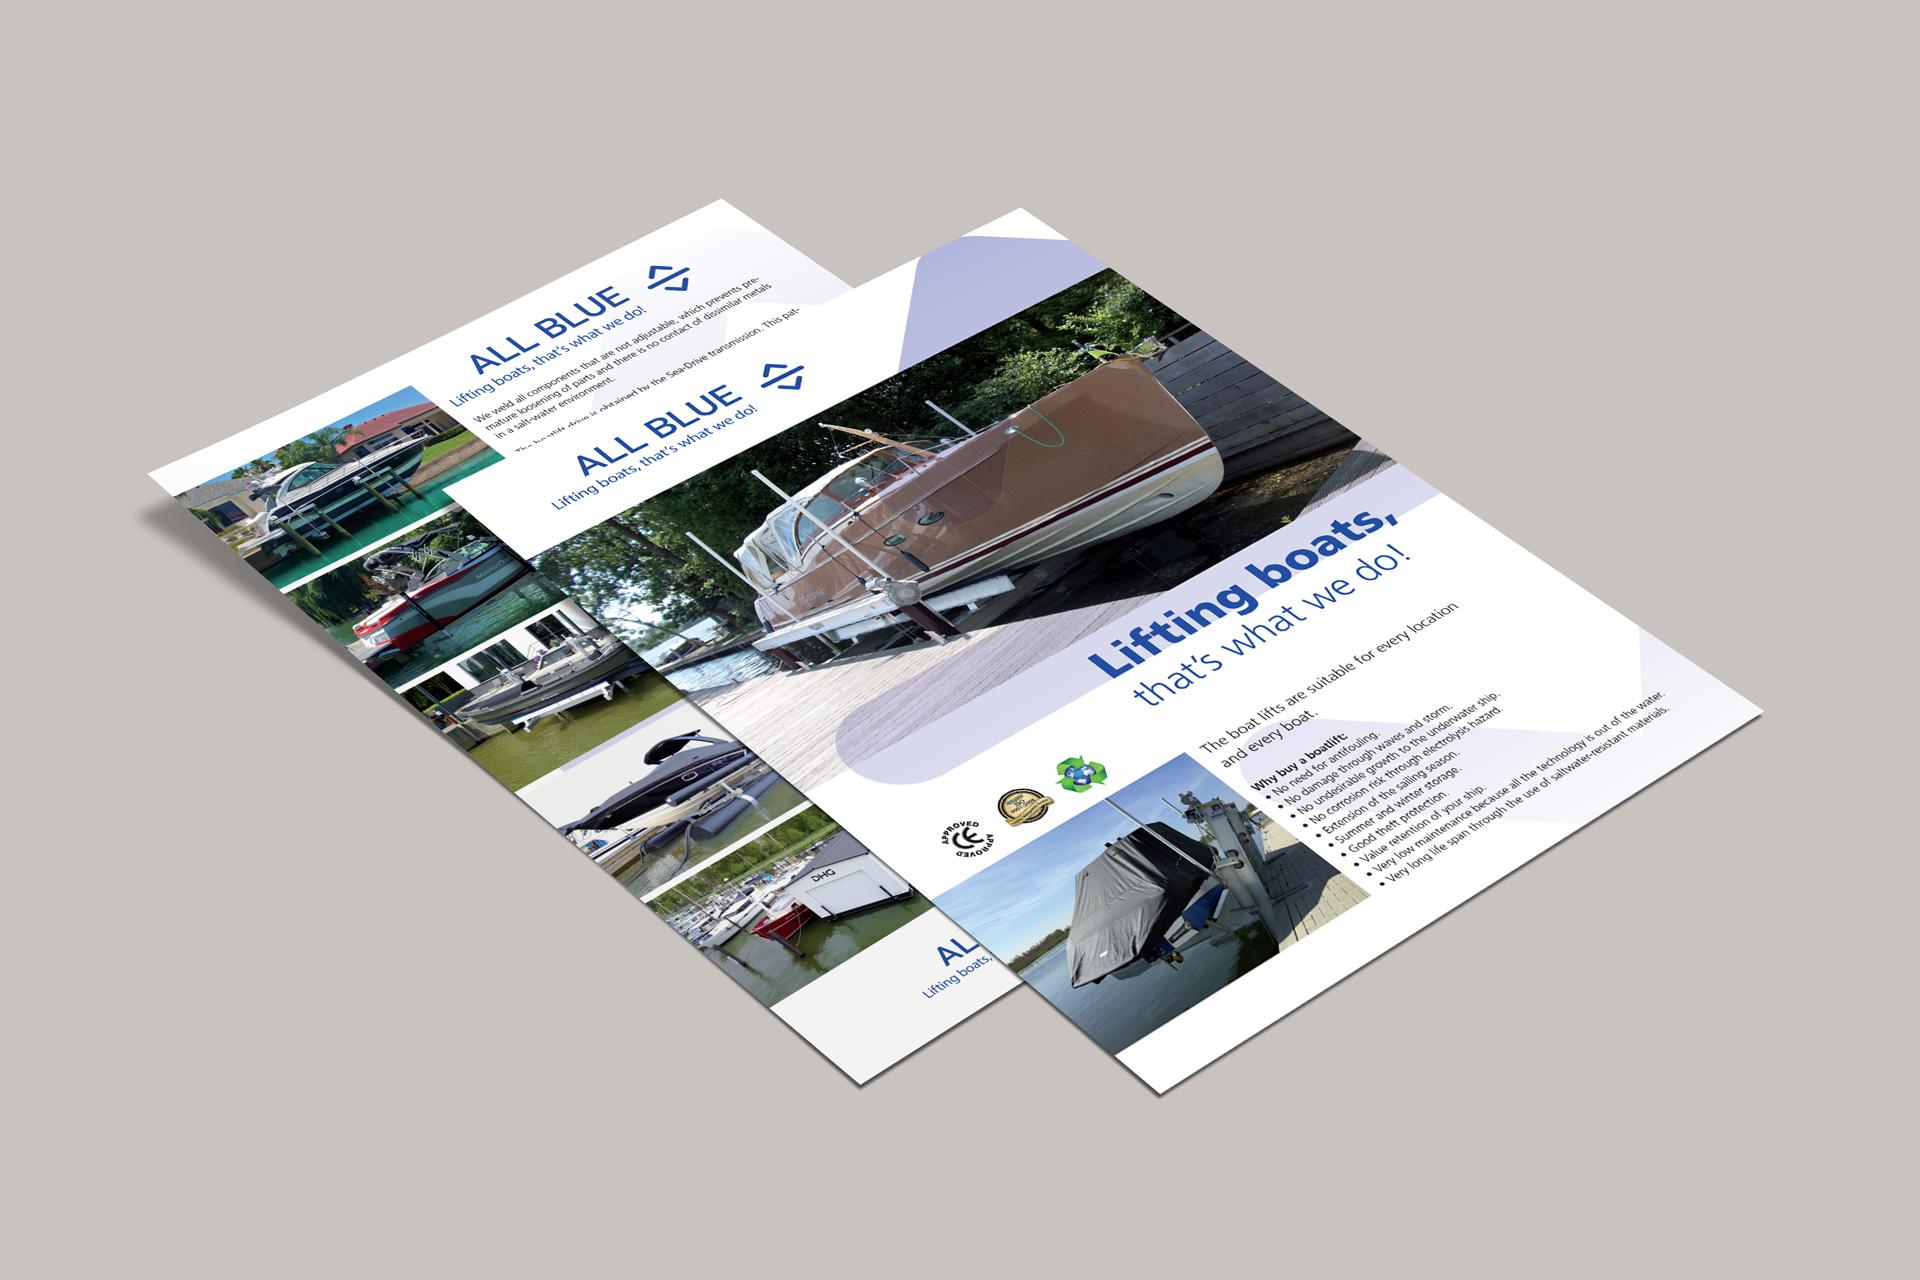 A4 Flyers - All Blue B.V. lifting boats, Ittervoort